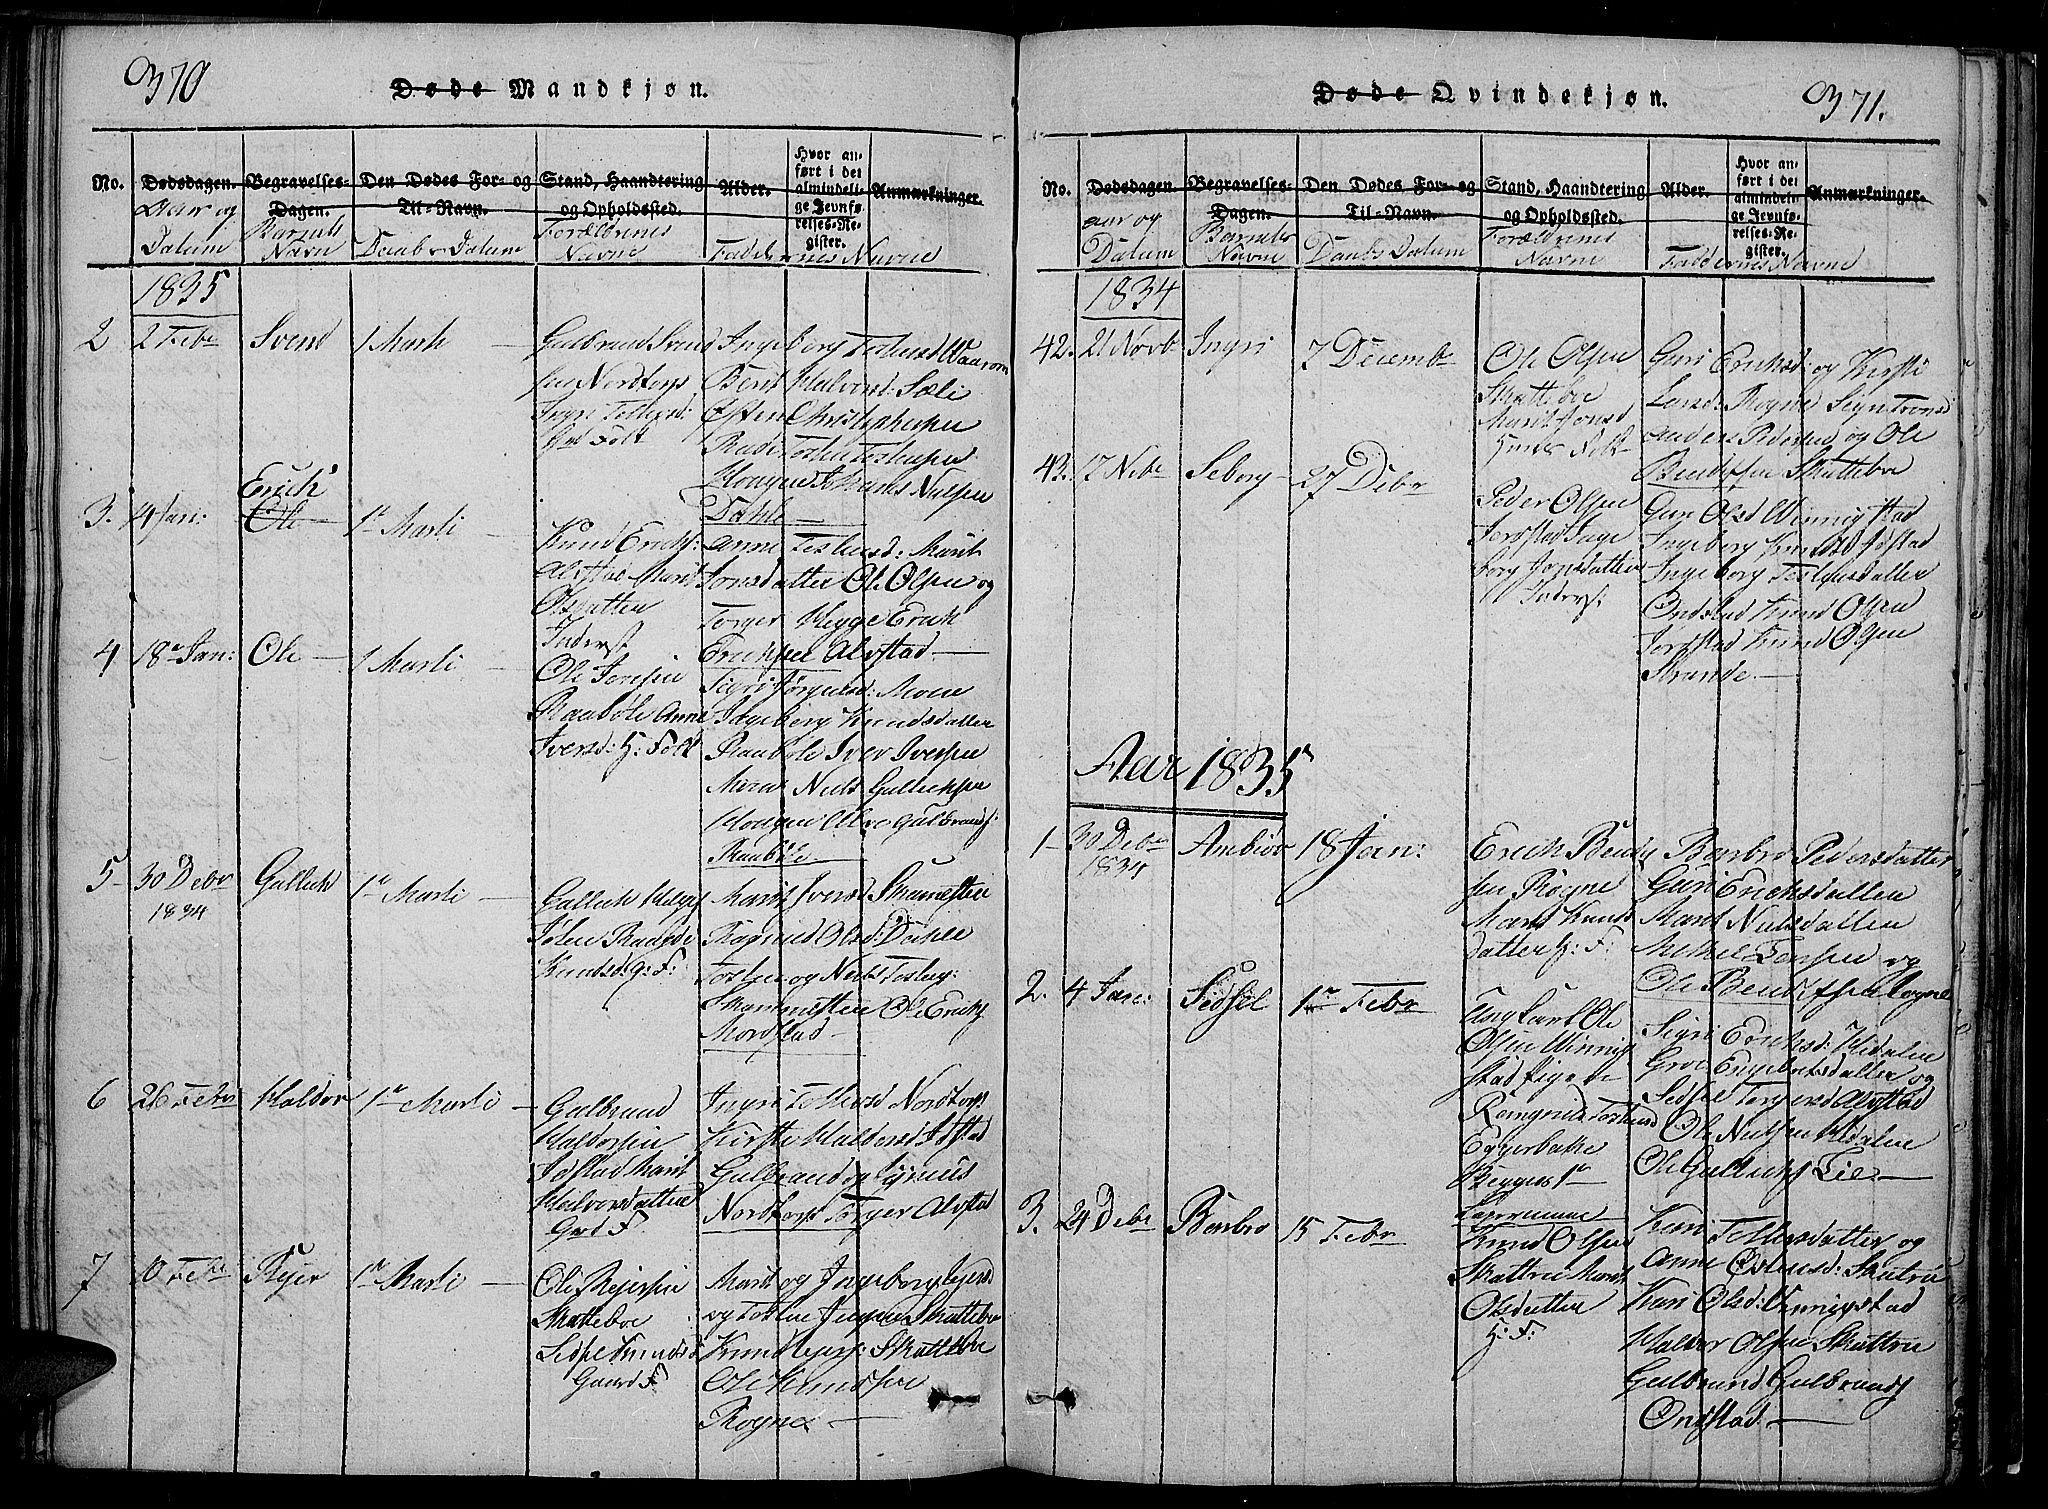 SAH, Slidre prestekontor, Klokkerbok nr. 2, 1814-1839, s. 370-371